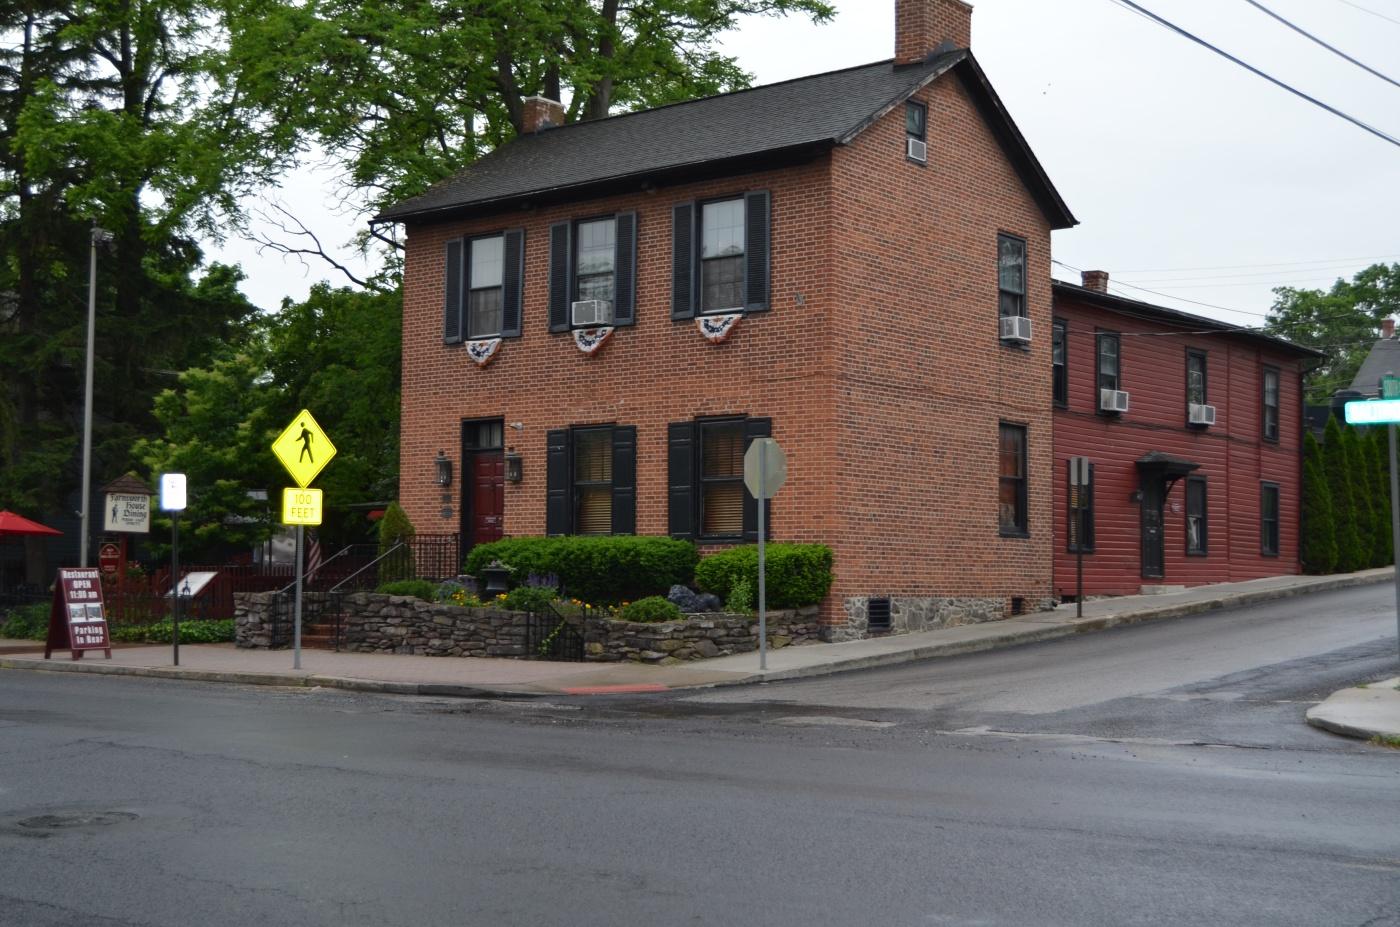 The farnsworth house inn in haunted gettysburg pa jamie for The farnsworth